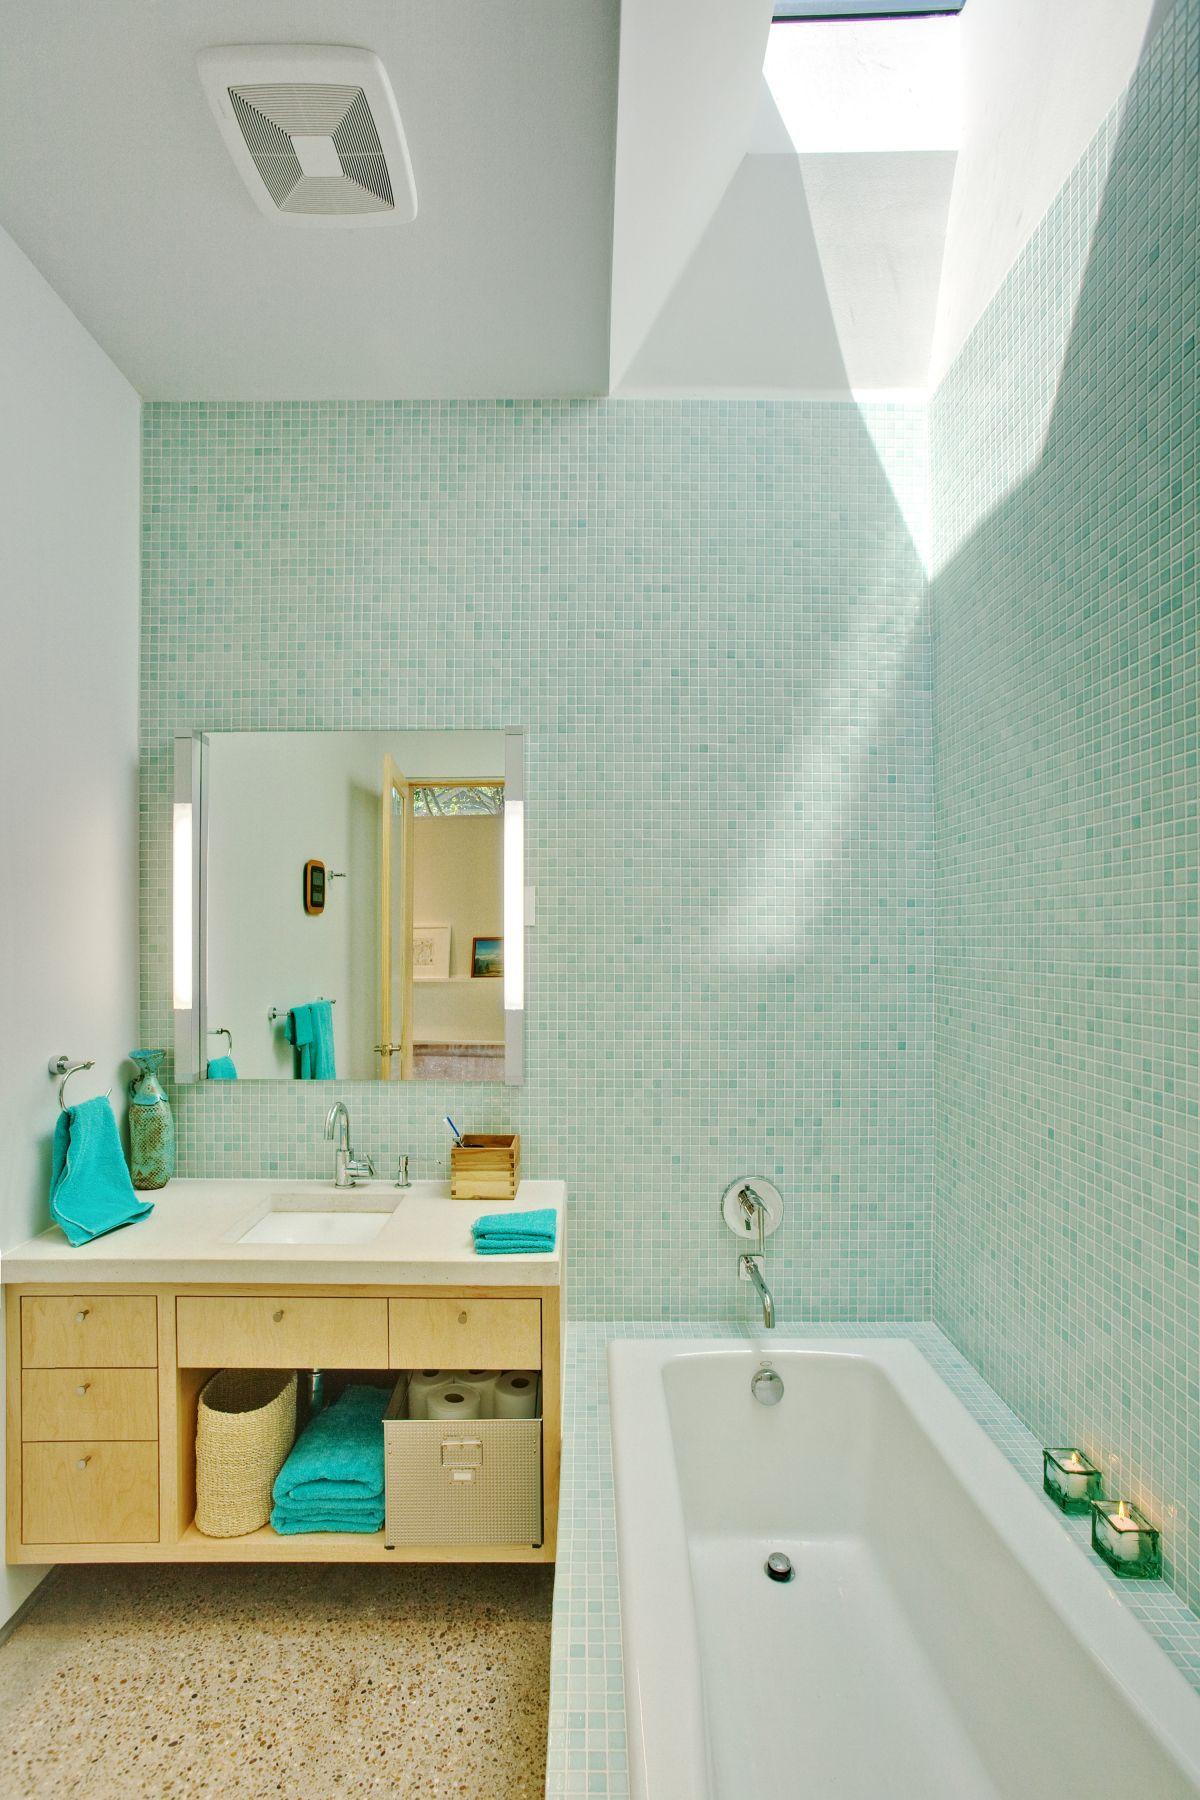 stylishly-simple-modern-1-story-house-18